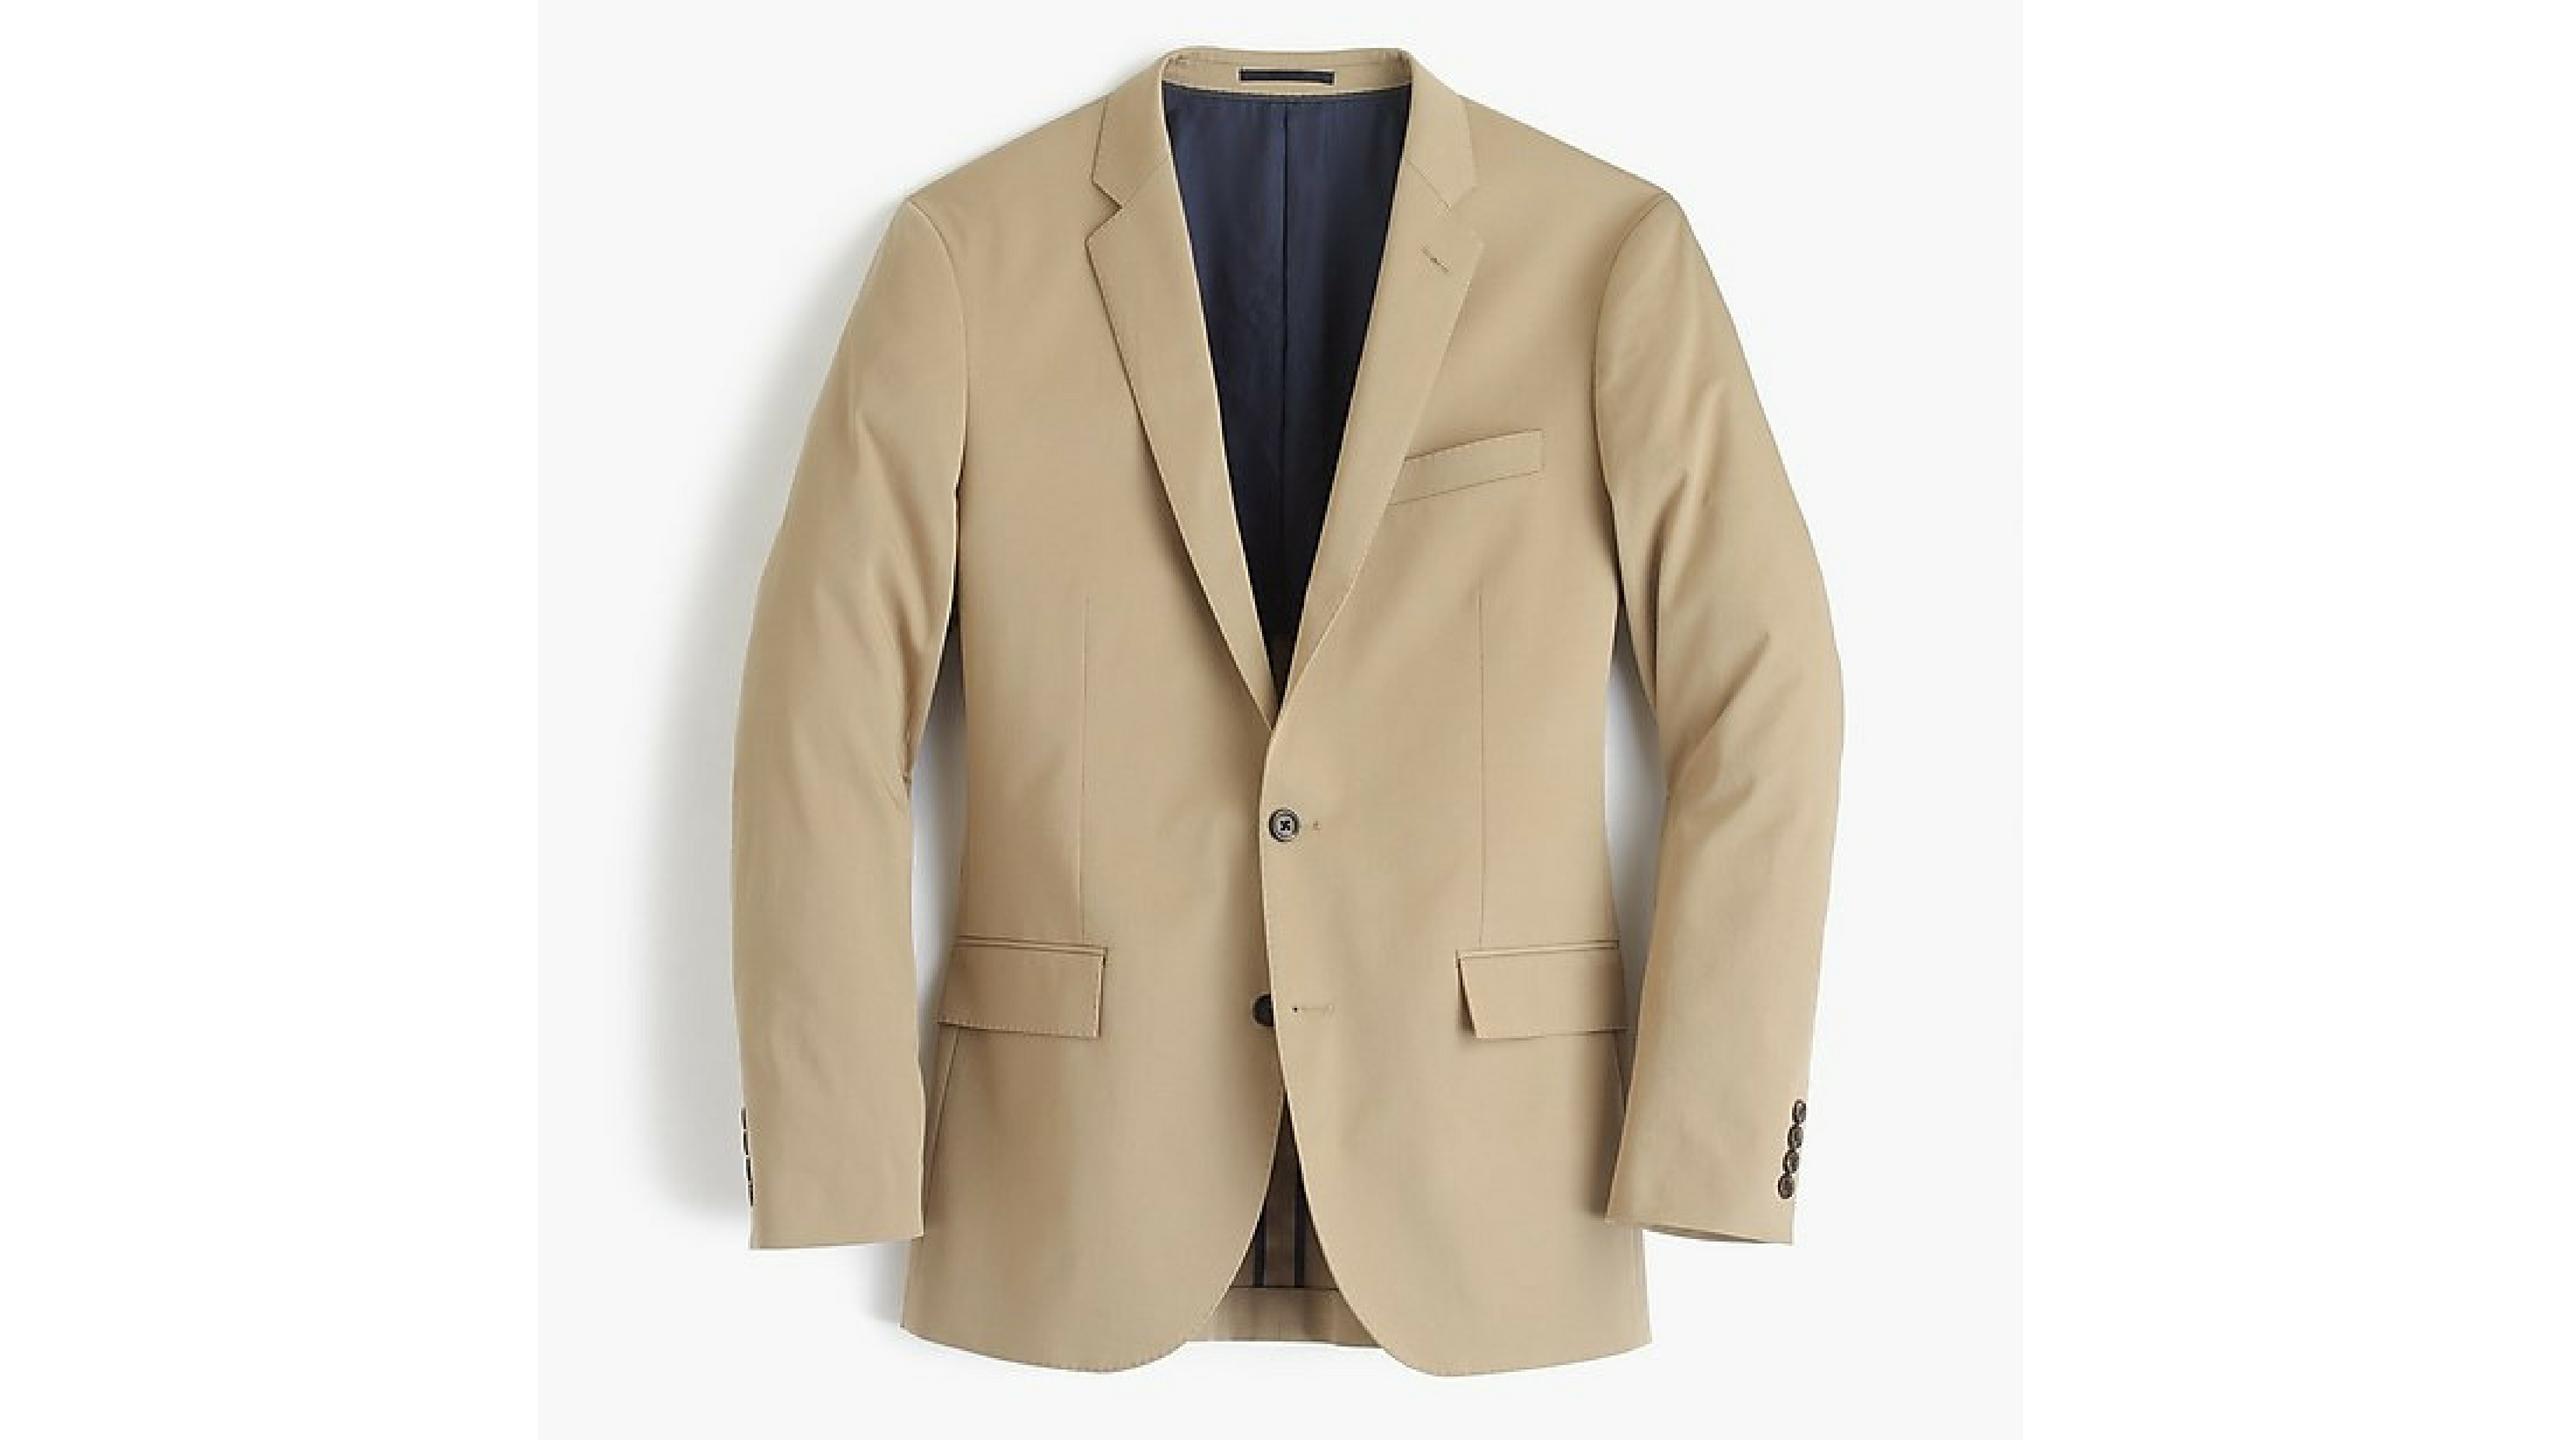 Khaki Suit J.Crew